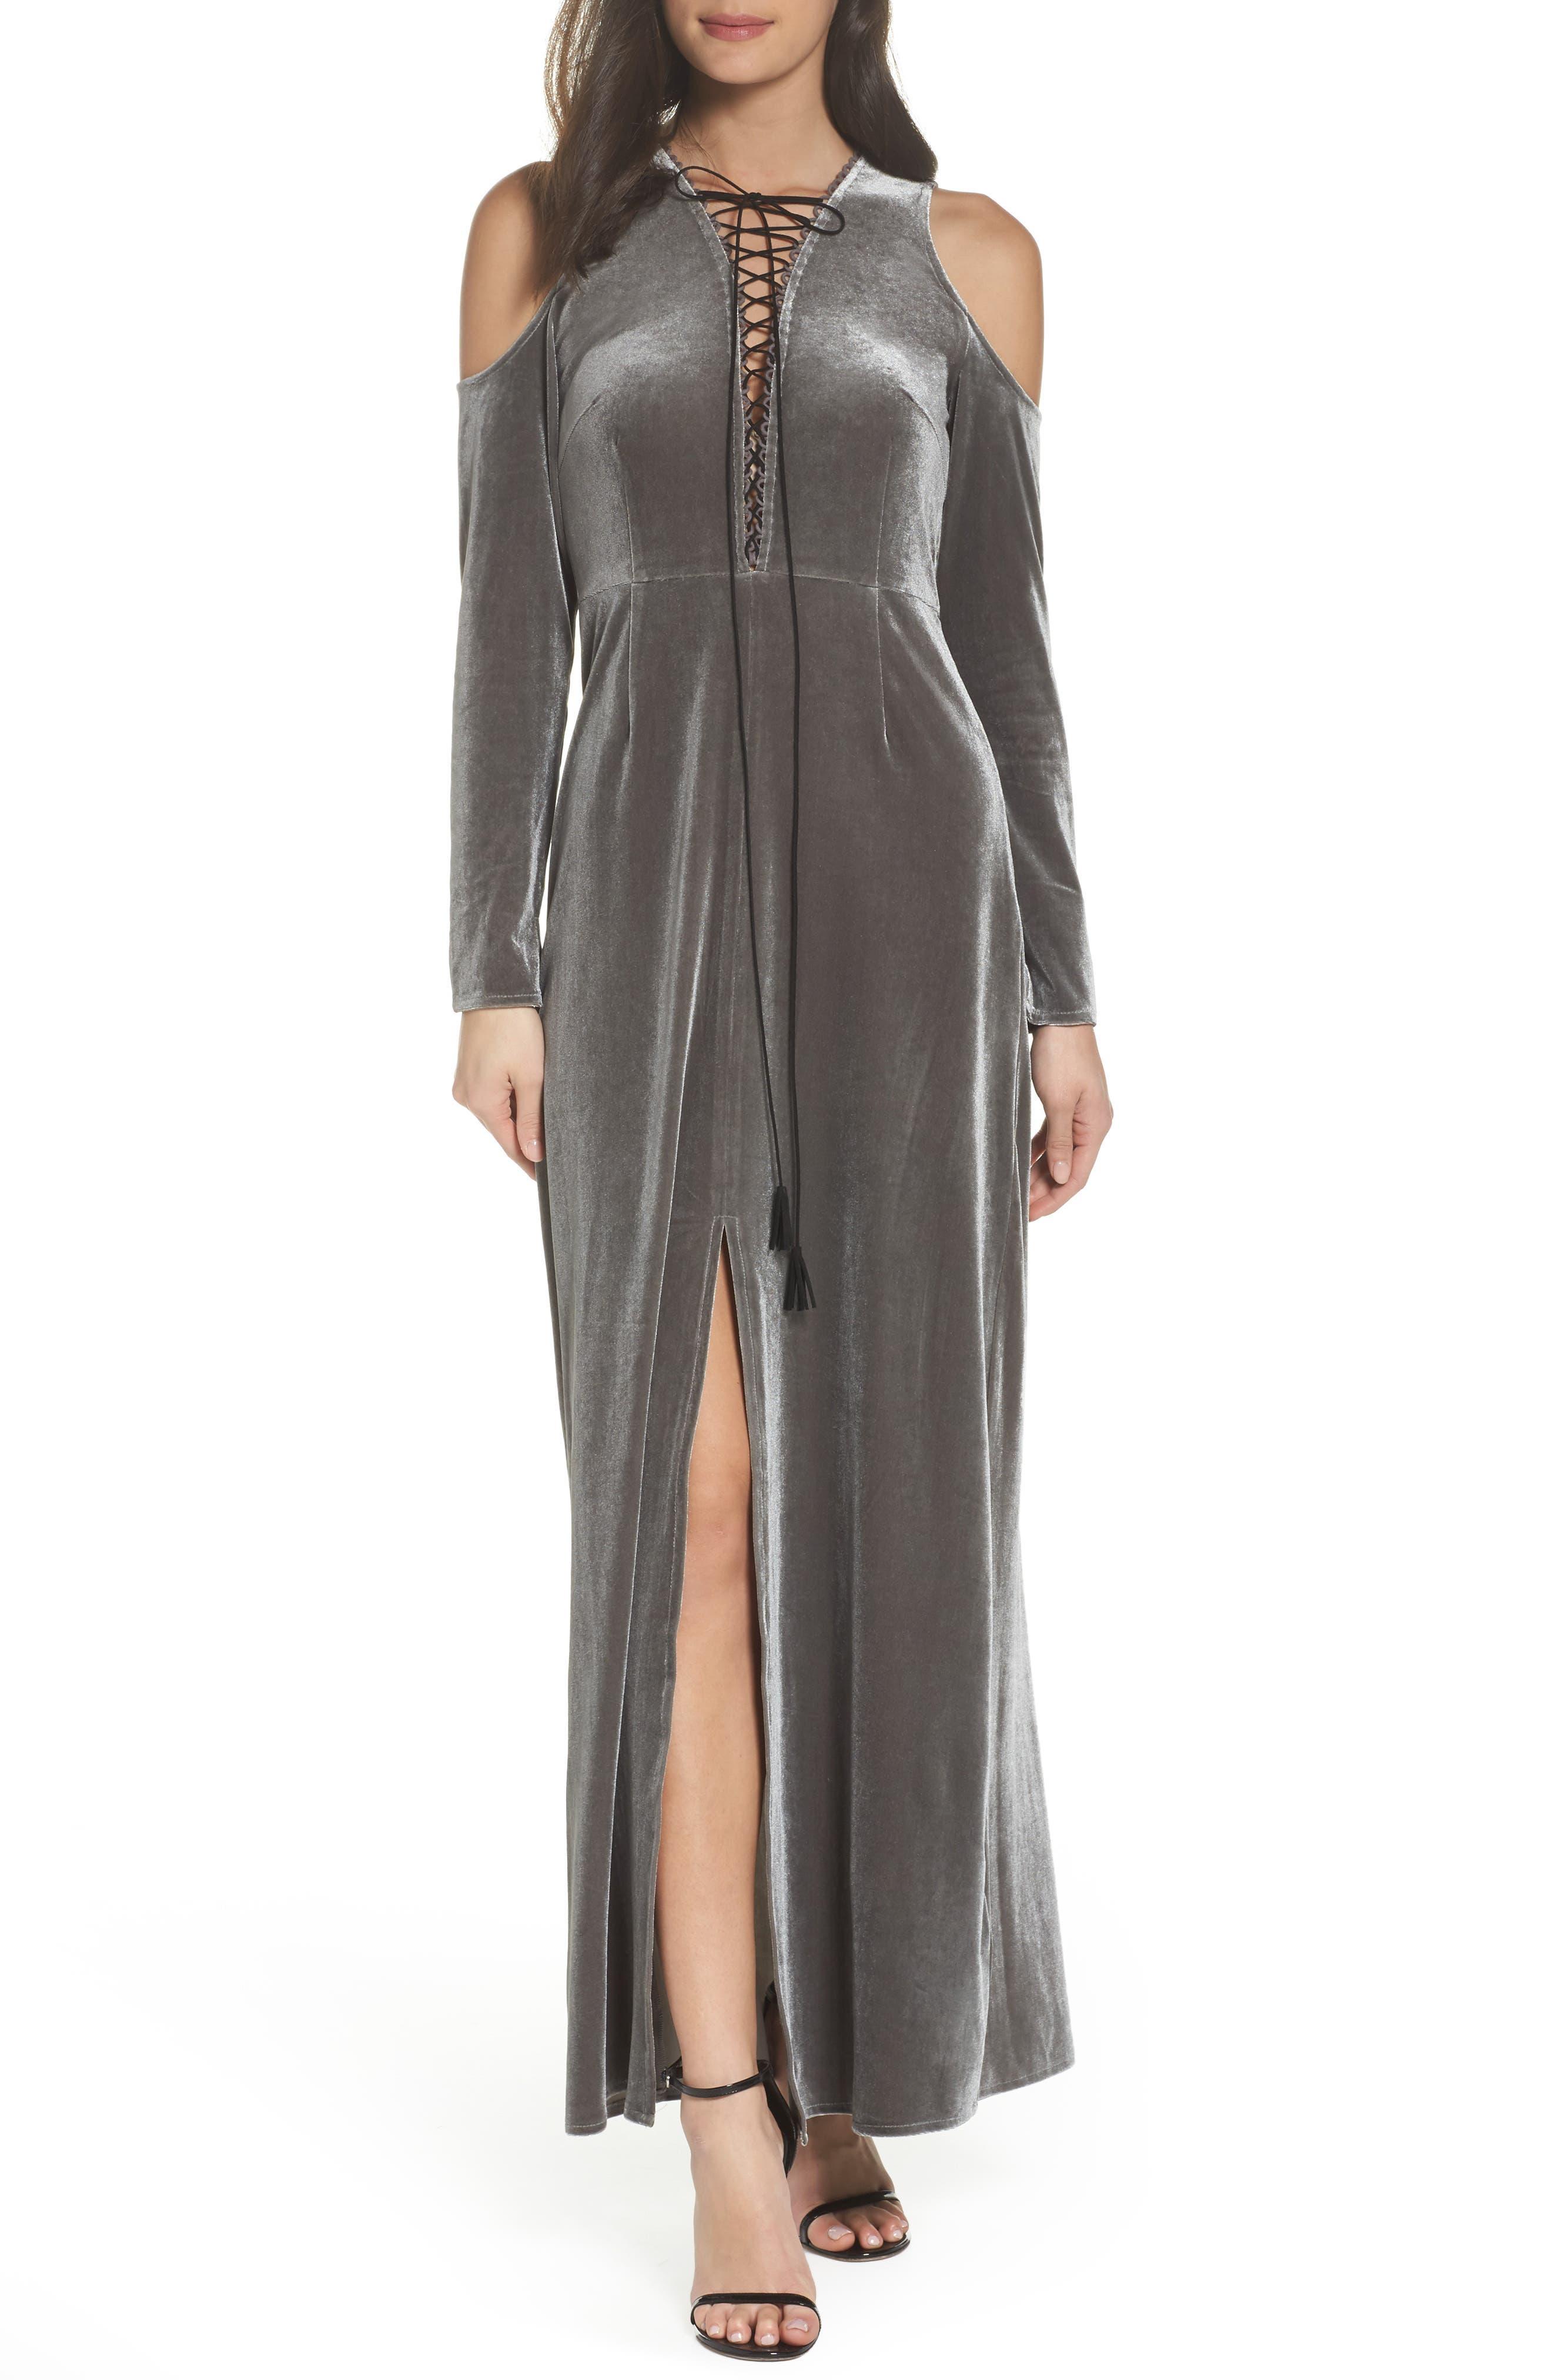 Main Image - Foxiedox Velvet Lace Up Dress